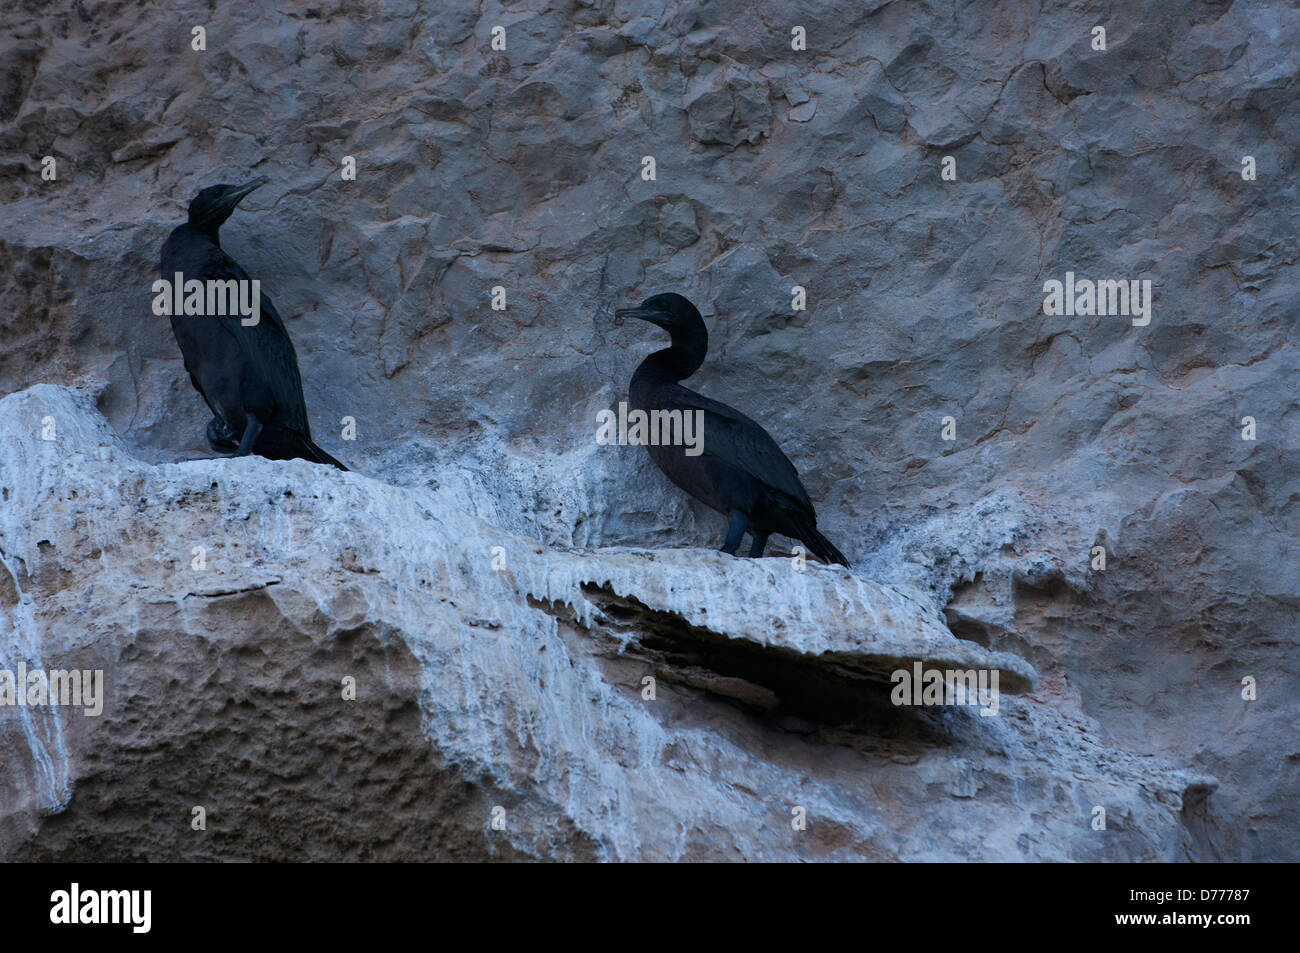 Endemic socotrian cormorants in Yemen - Stock Image